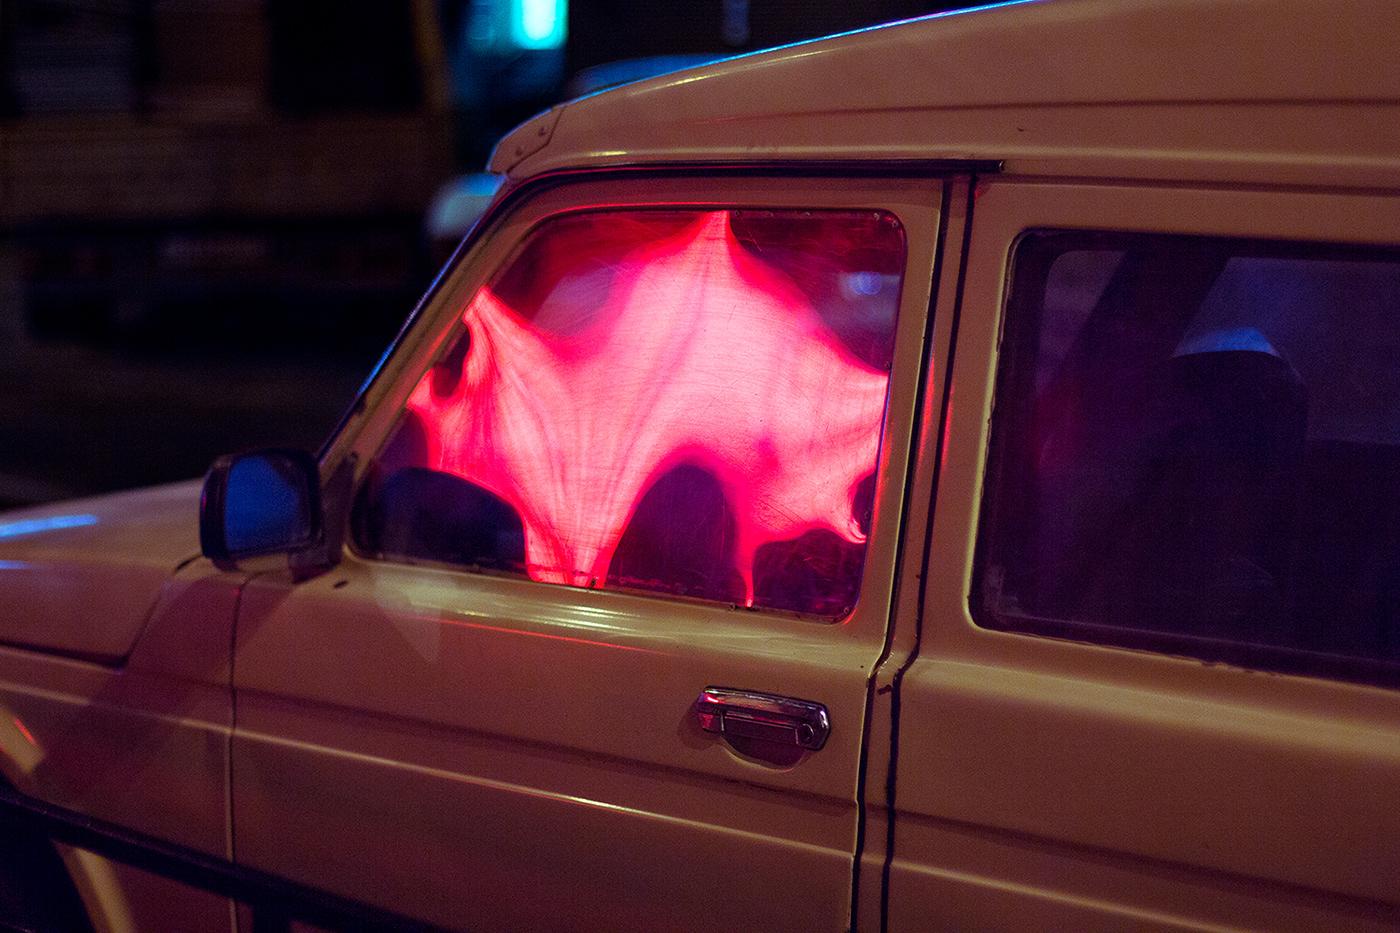 car night glow drops neon colorful smooth lights acid glass